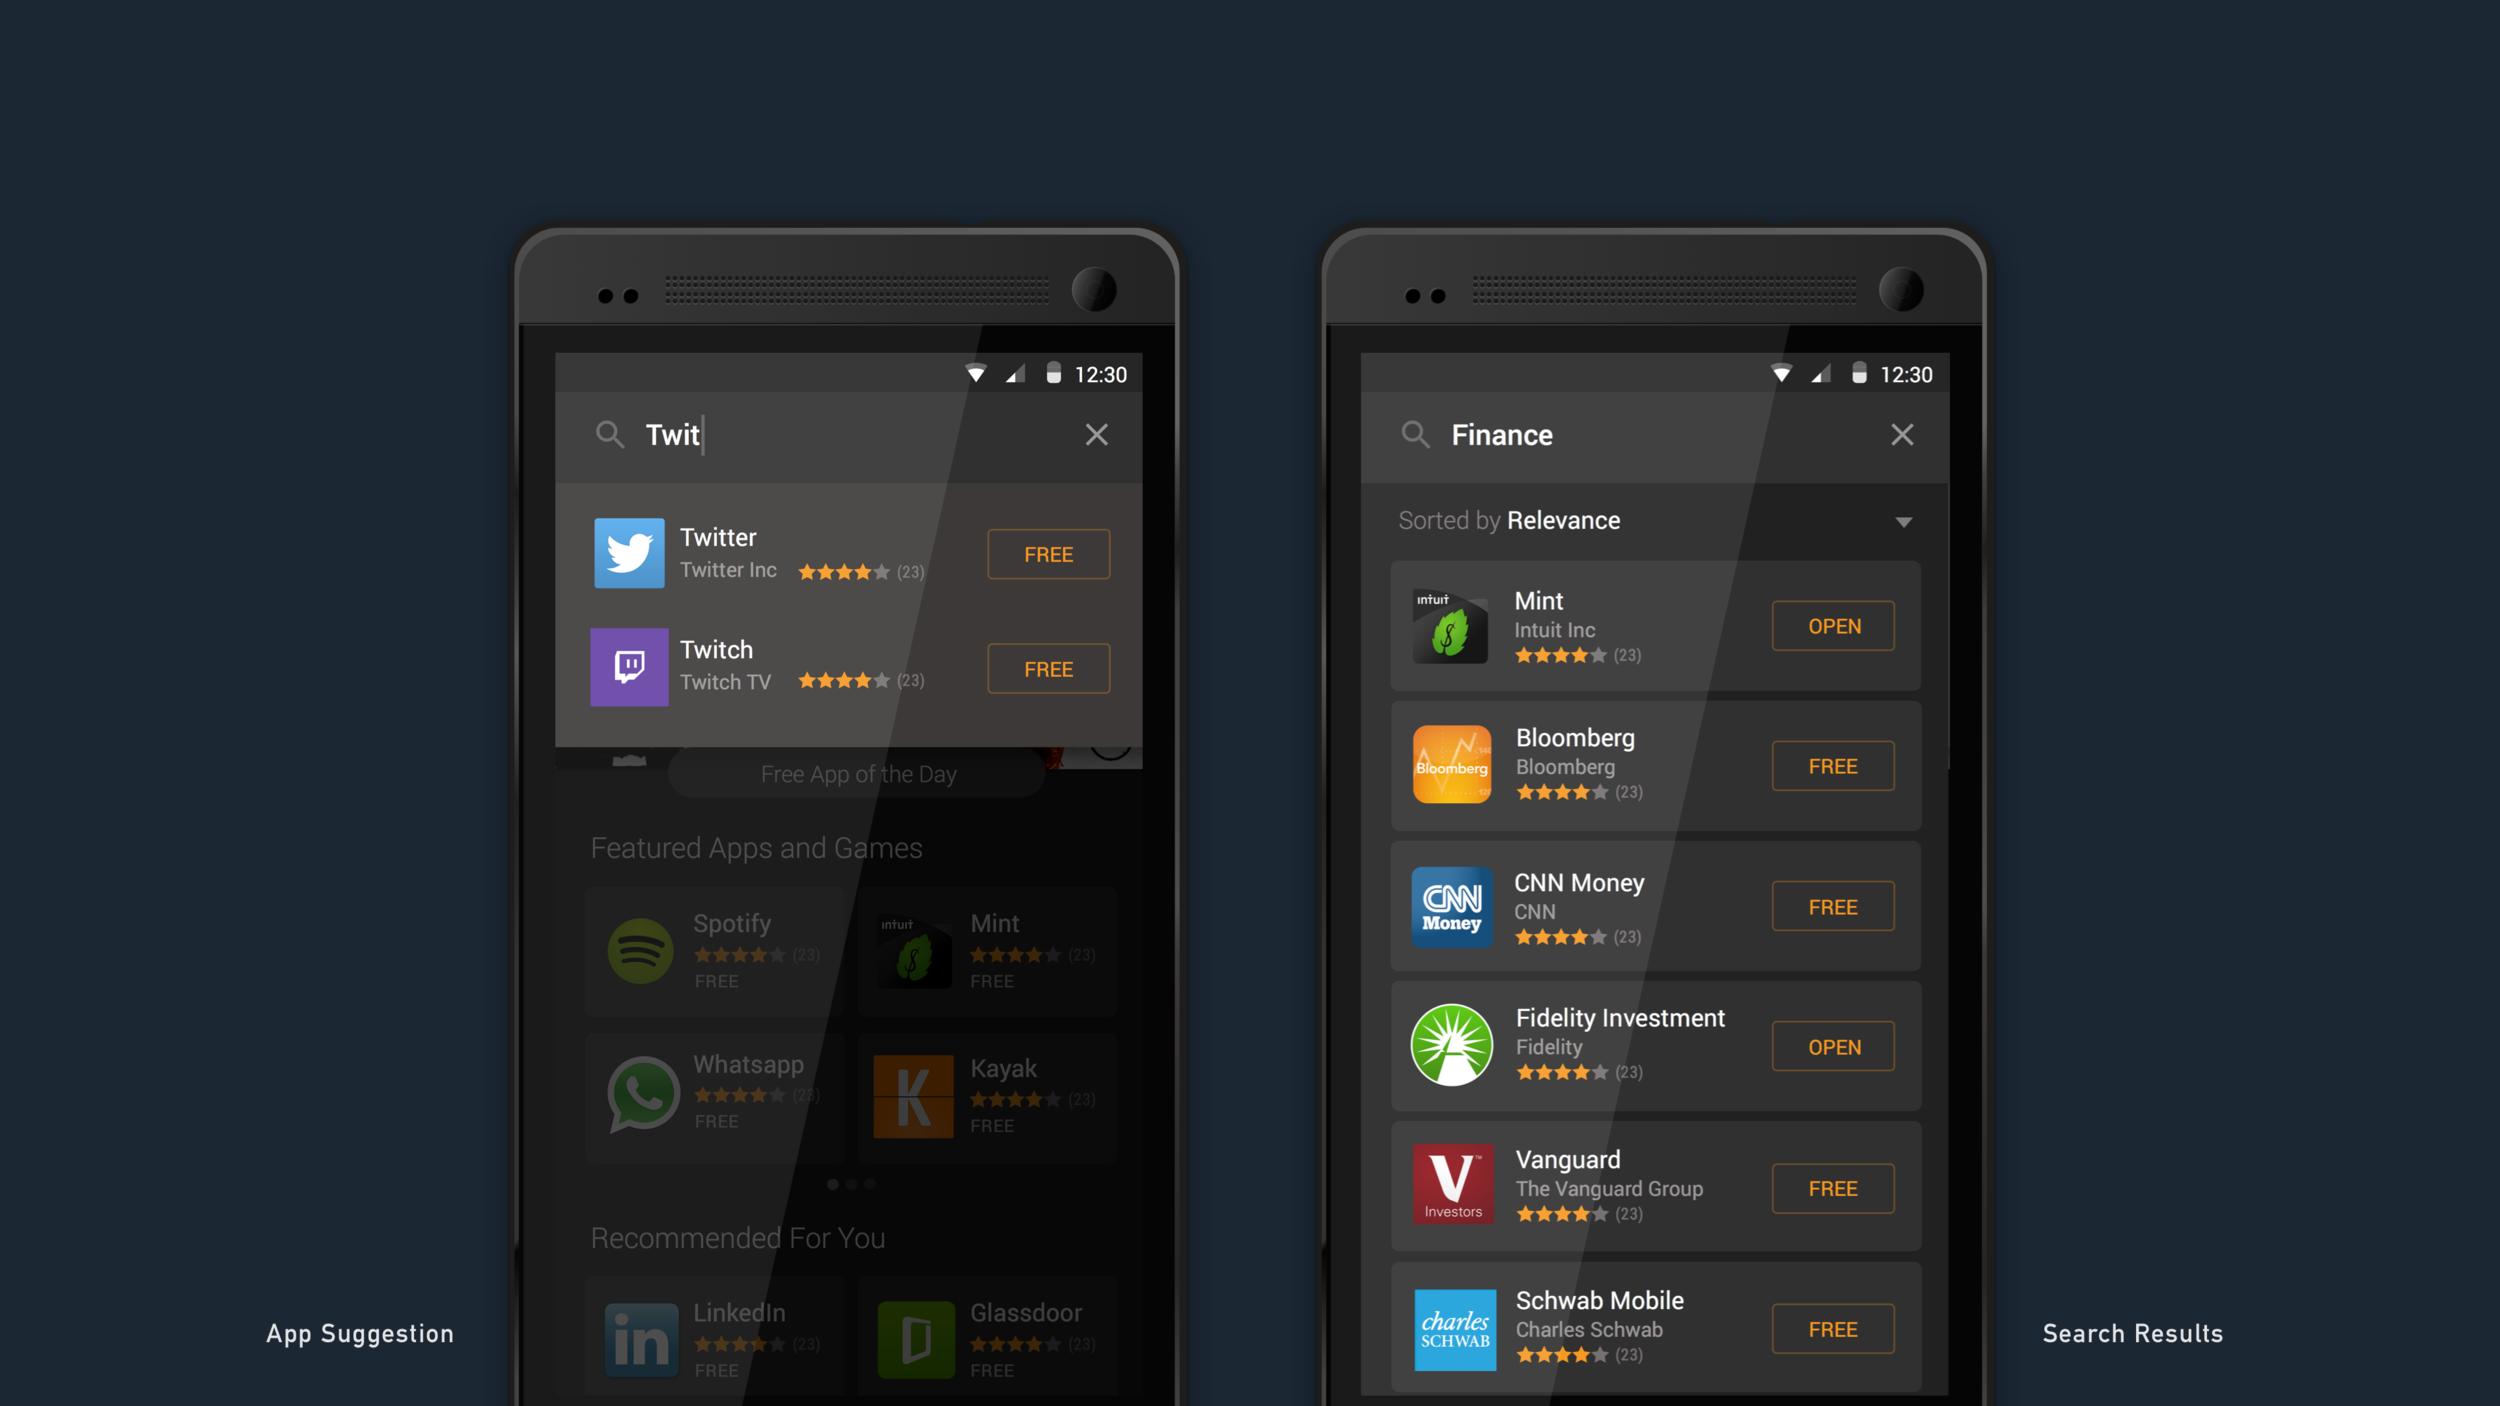 14 Final Design C - Amazon Appstore.png